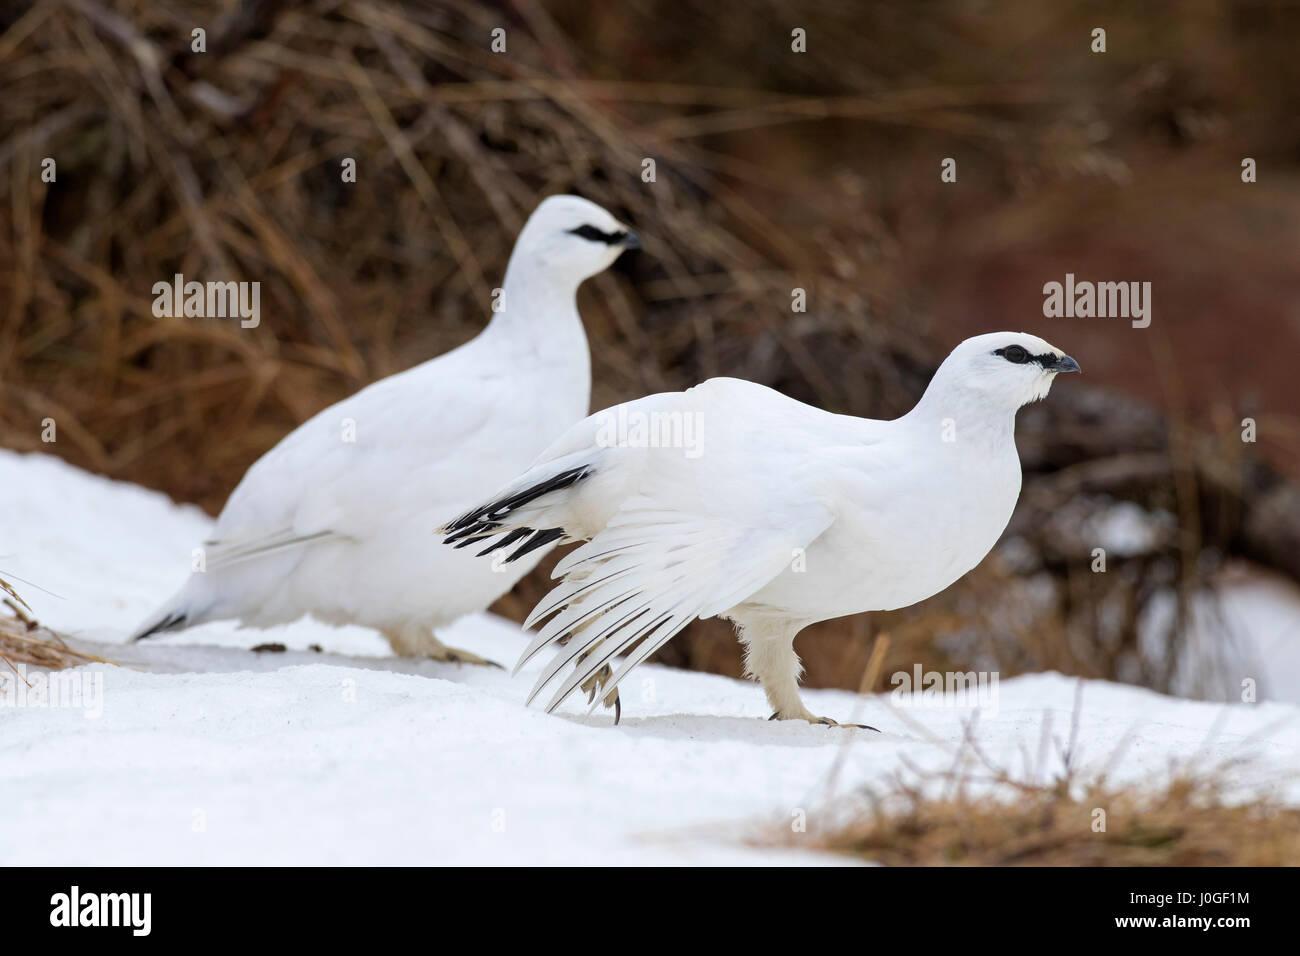 Two rock ptarmigans (Lagopus muta / Lagopus mutus) in winter plumage - Stock Image